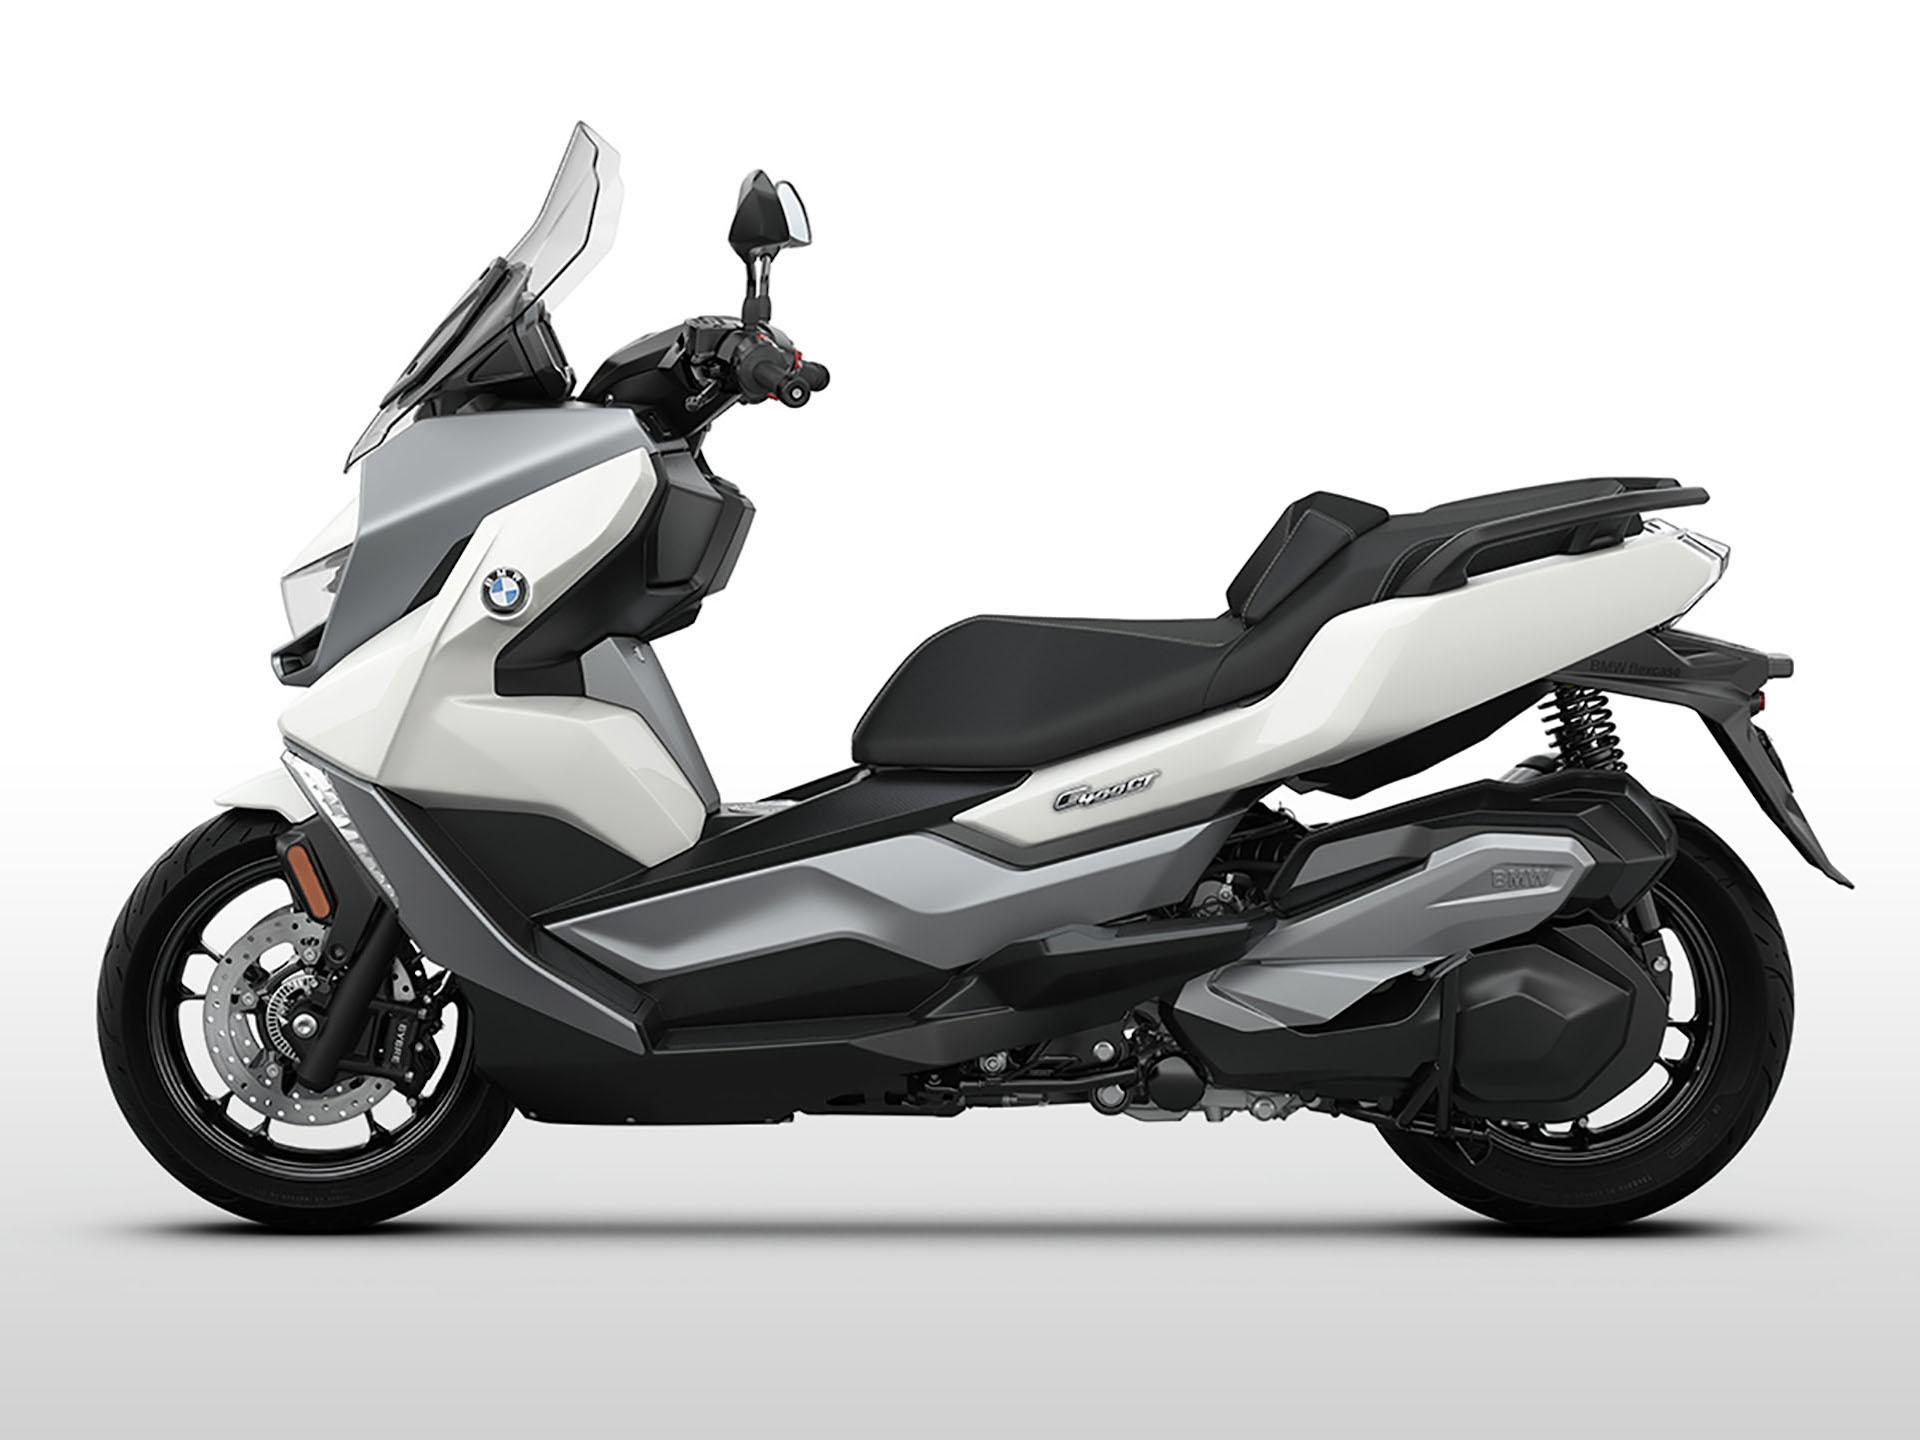 bmw-motorrad-c-400-gt